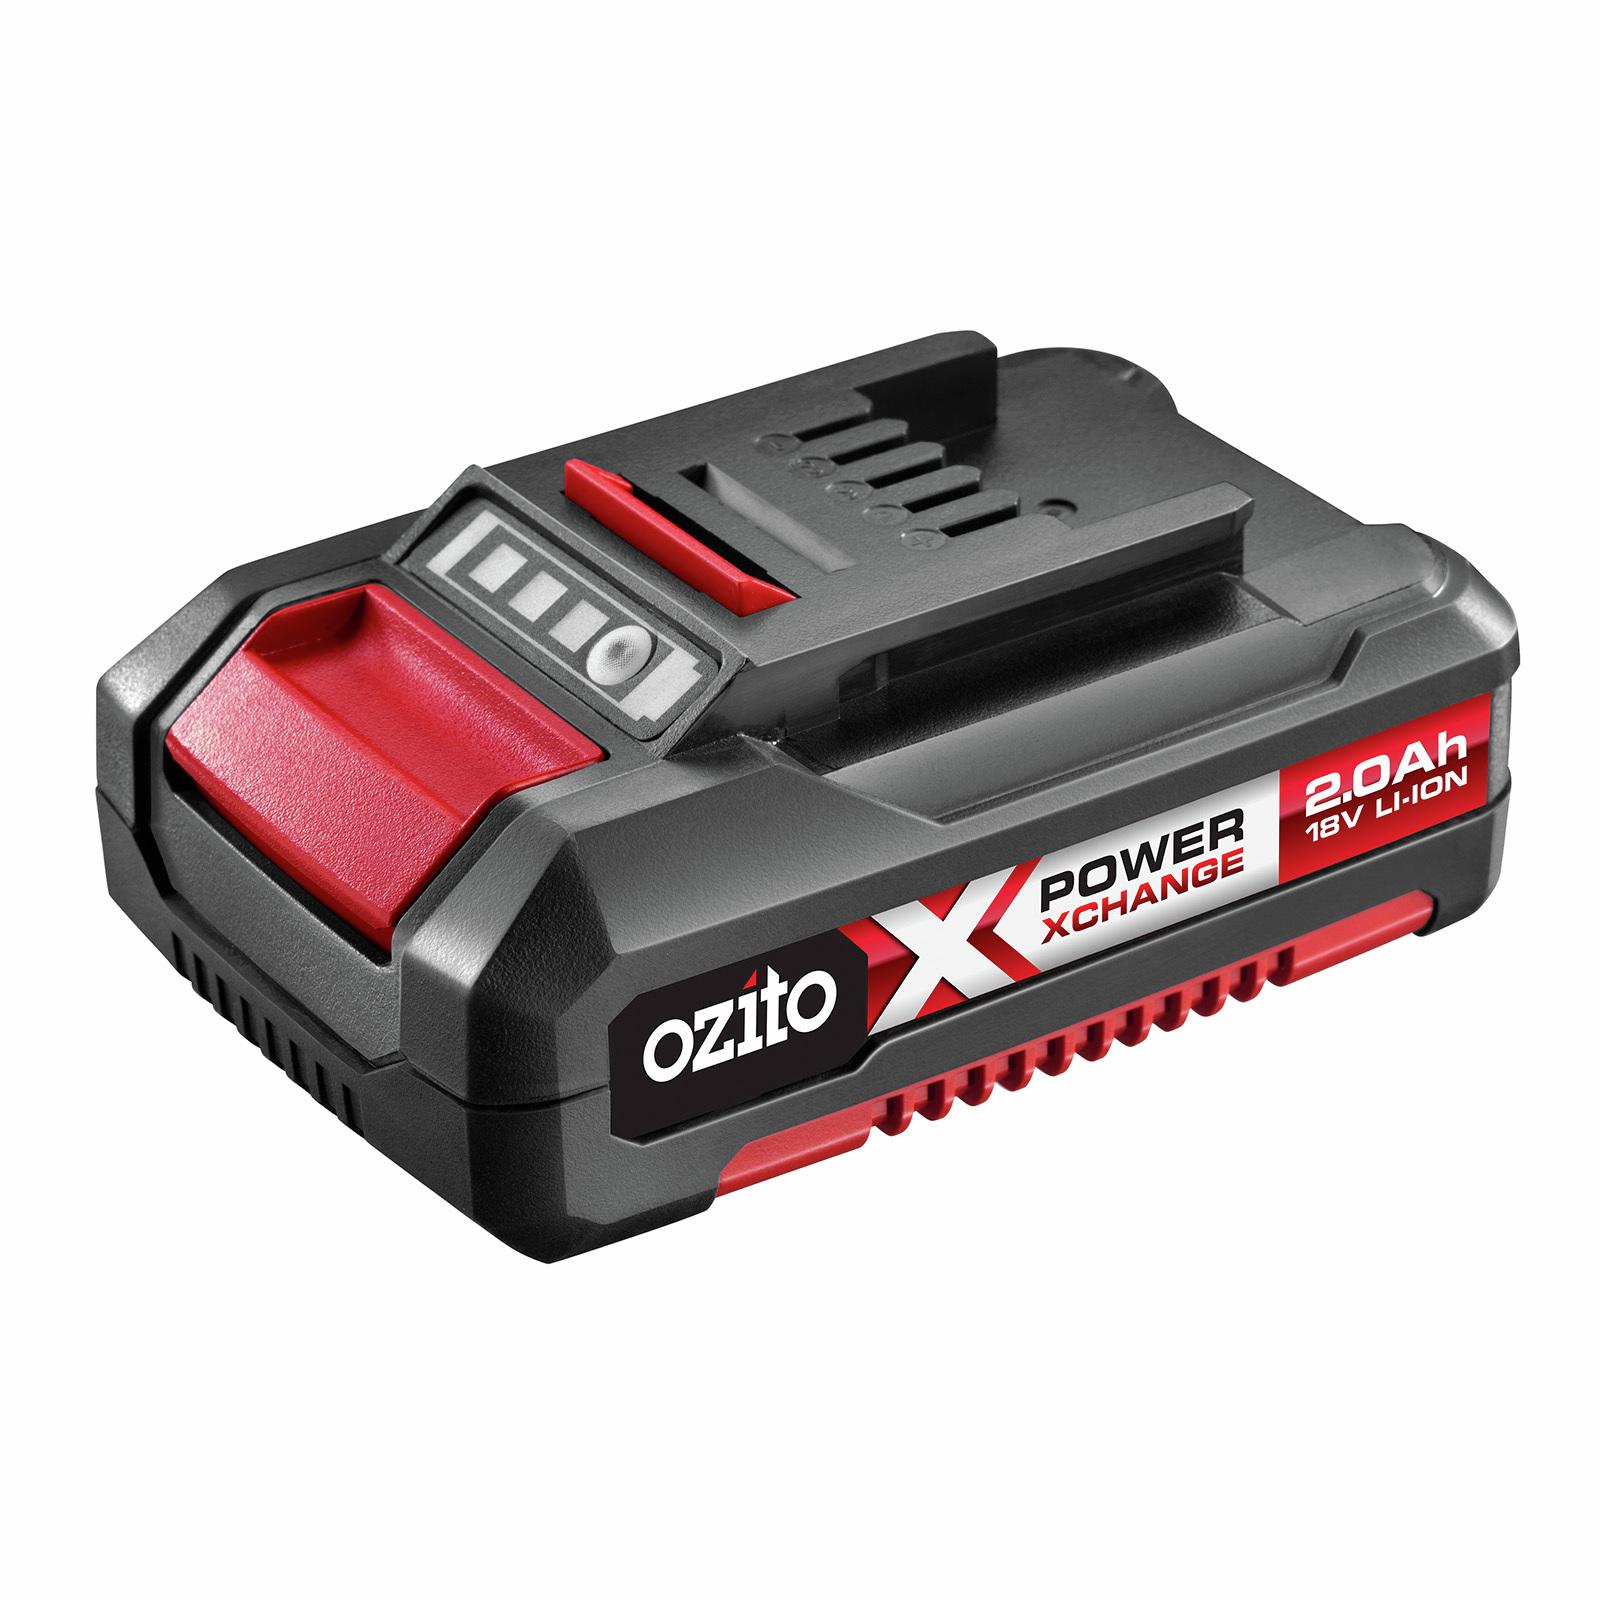 Ozito PXC 18V 2.0Ah Lithium-Ion Battery